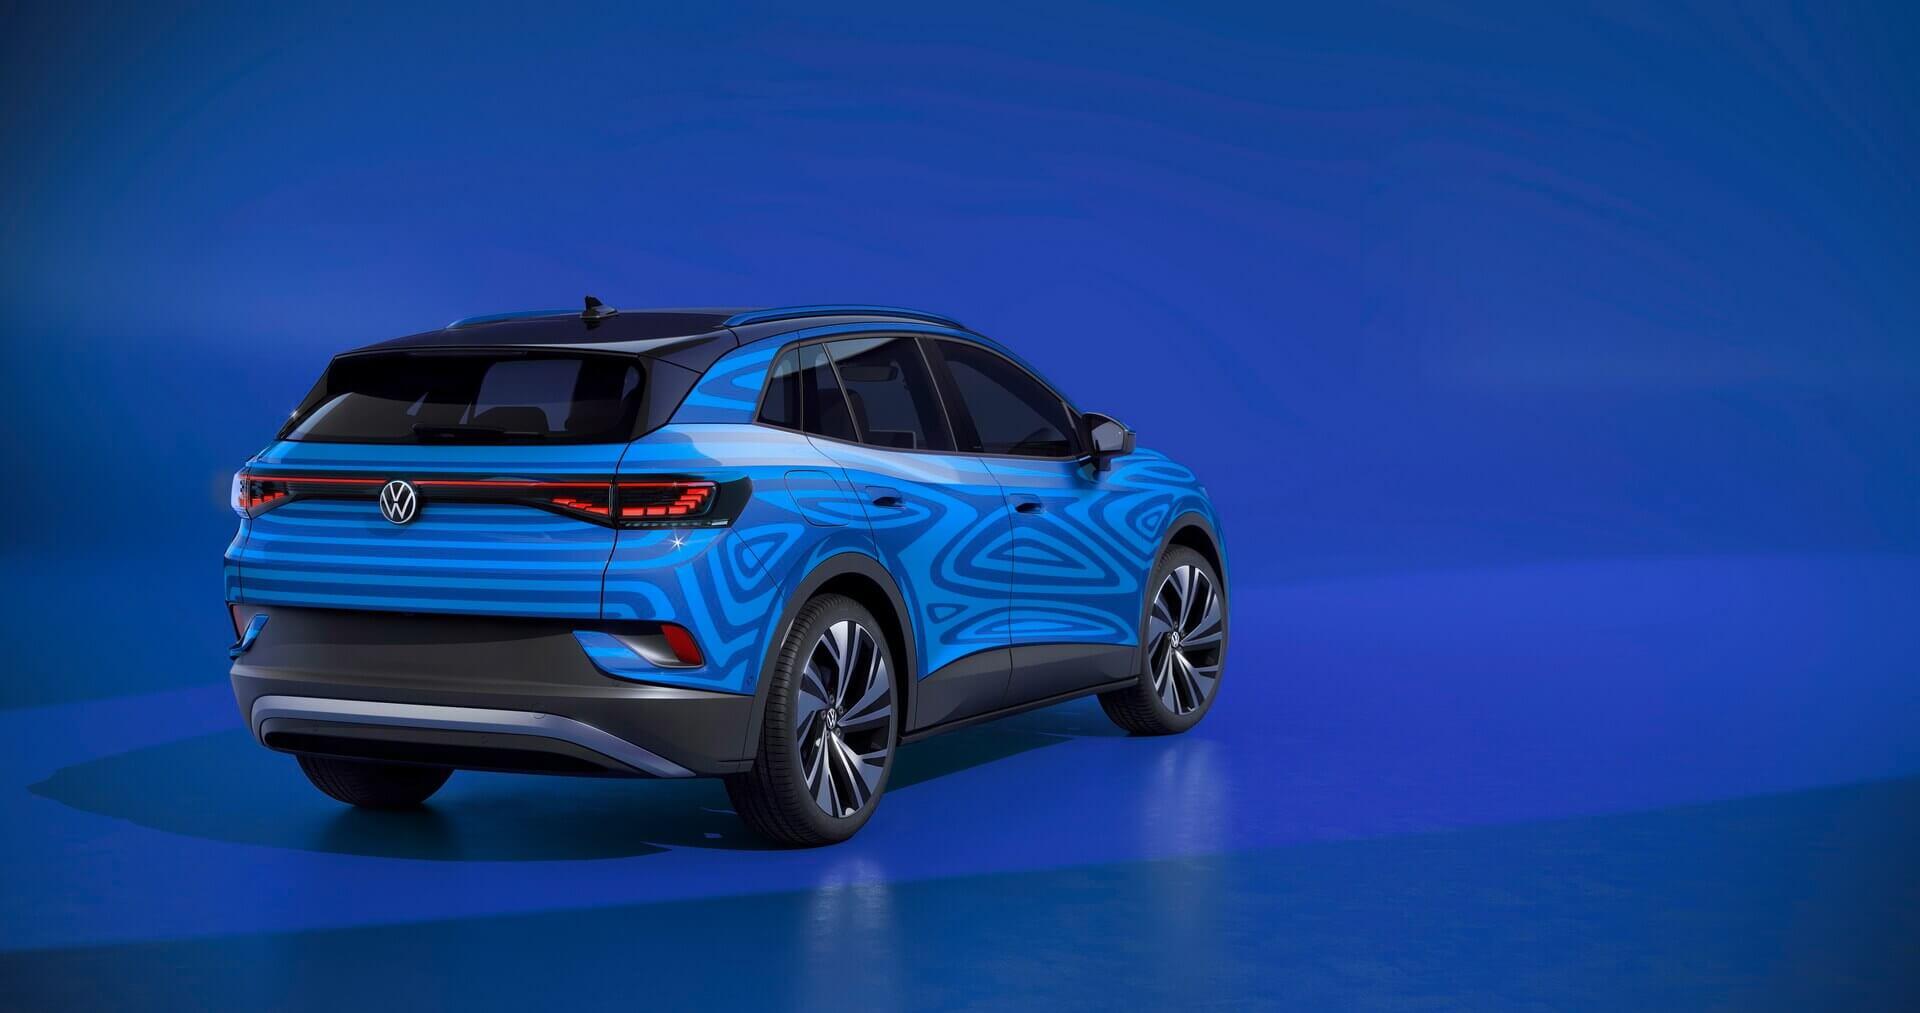 Электрический кроссовер Volkswagen ID.4